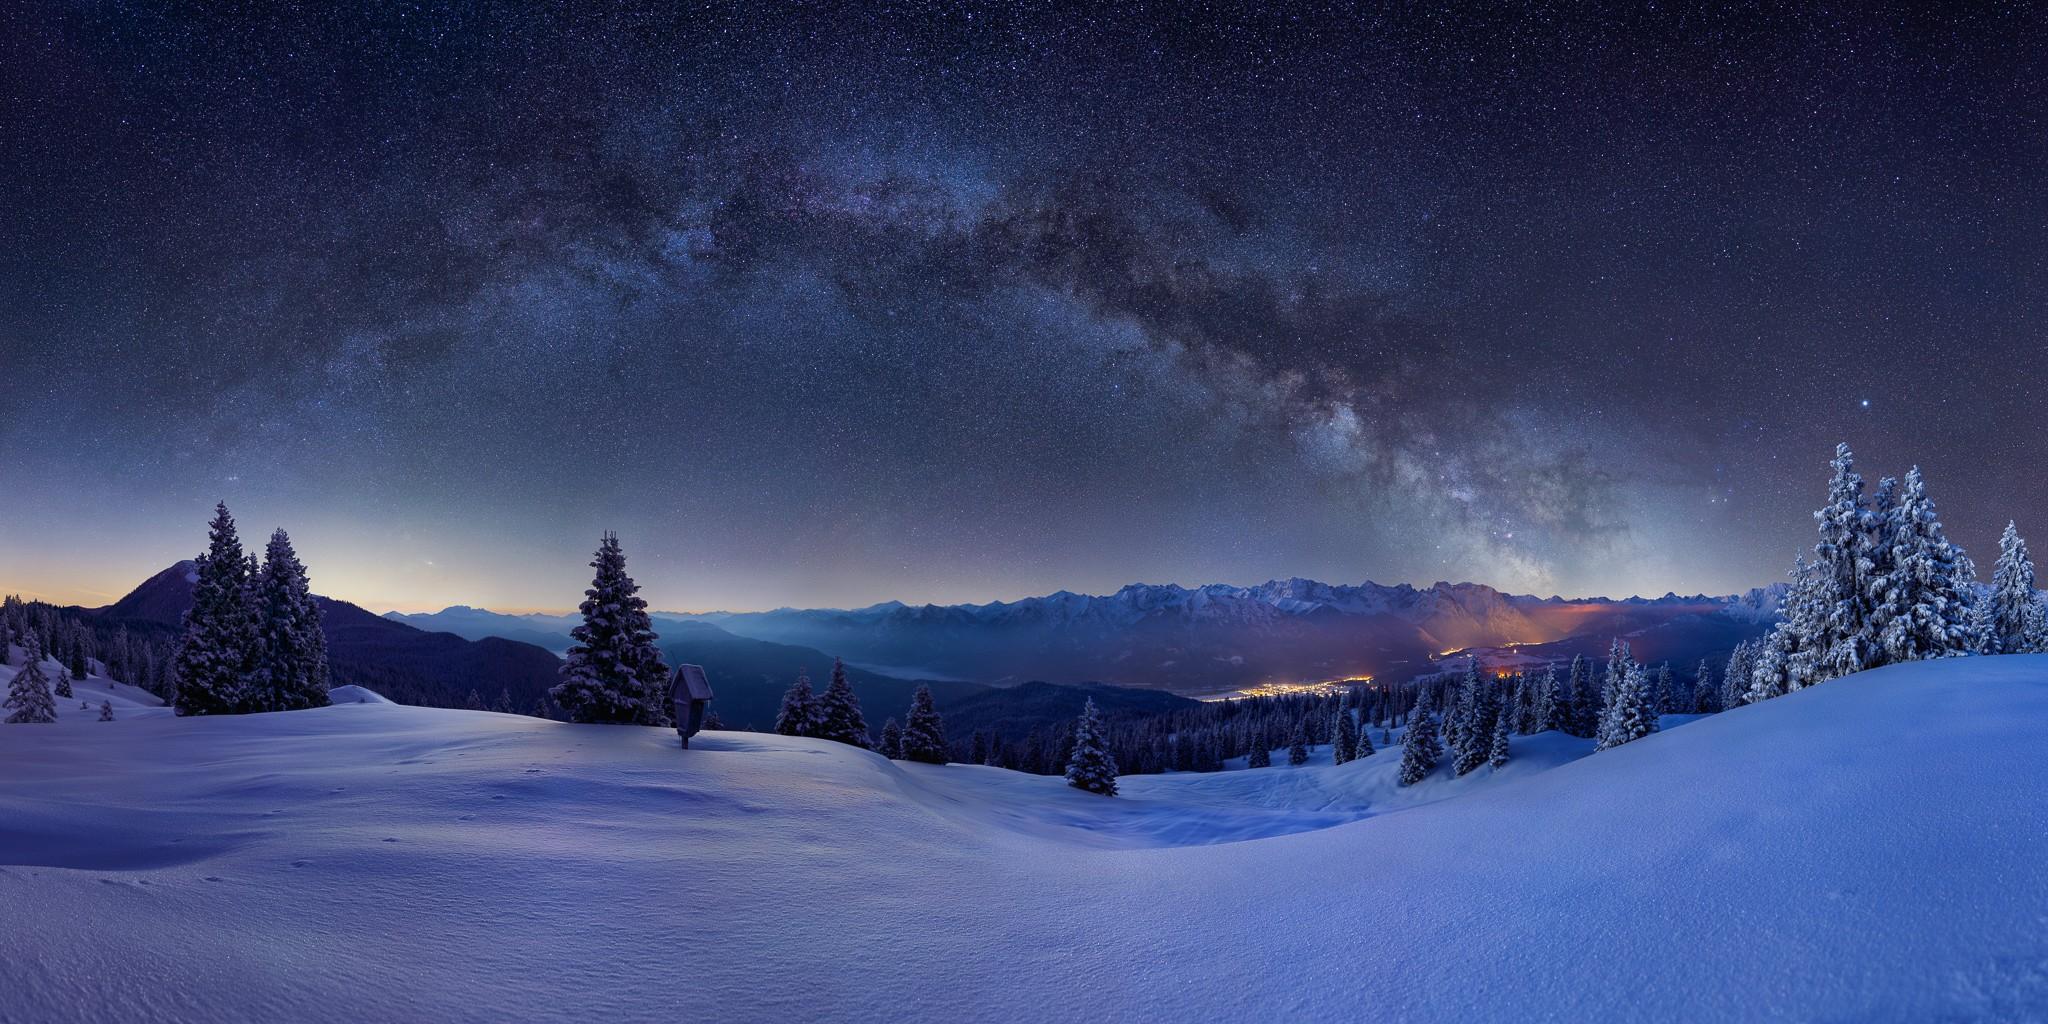 Milchstraße über dem Karwendel - Winterlandschaft